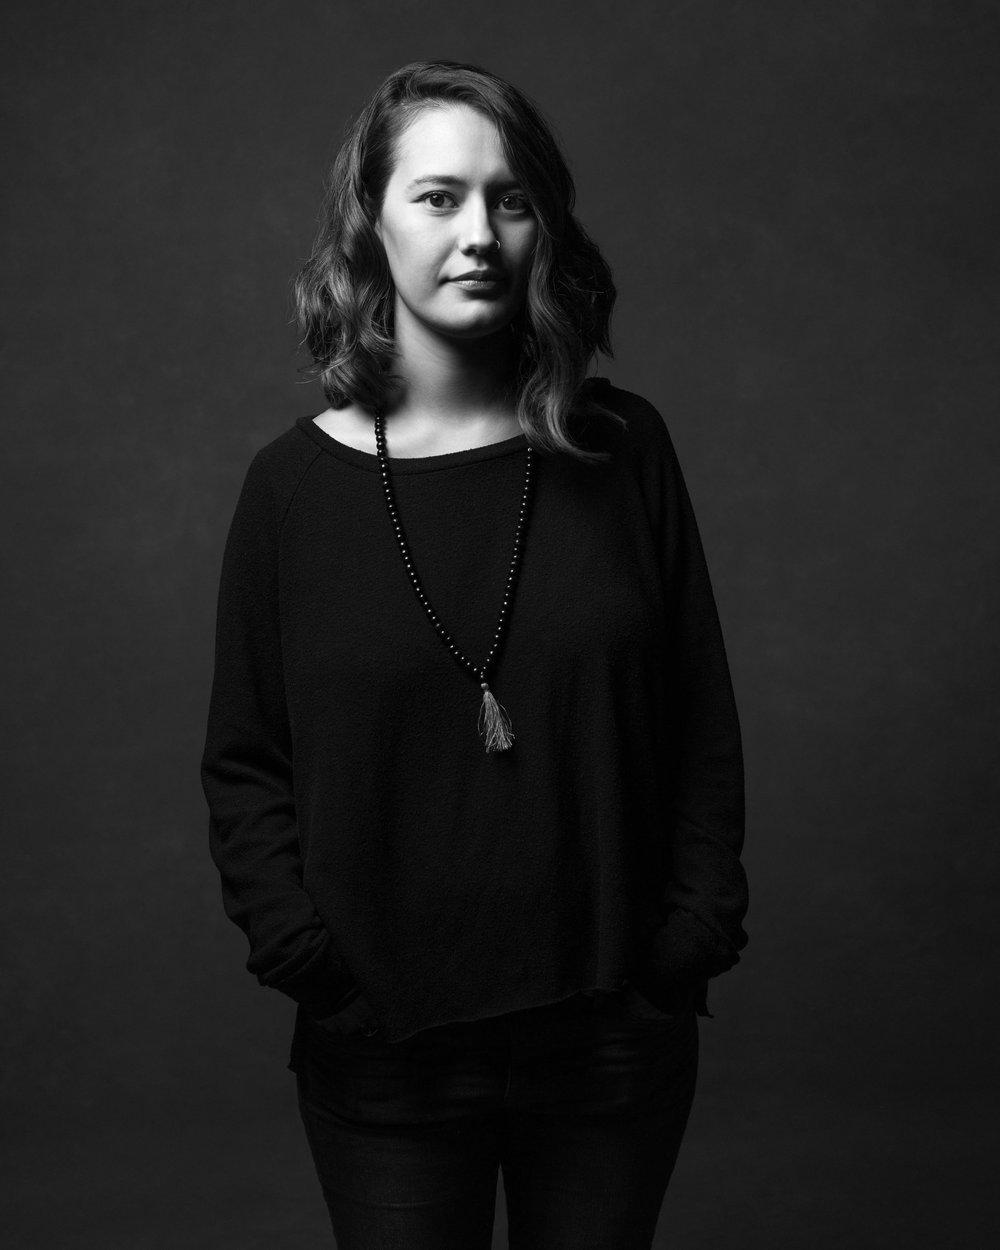 Daniela Castillo - Feminist / Actress / Yogi / Poet